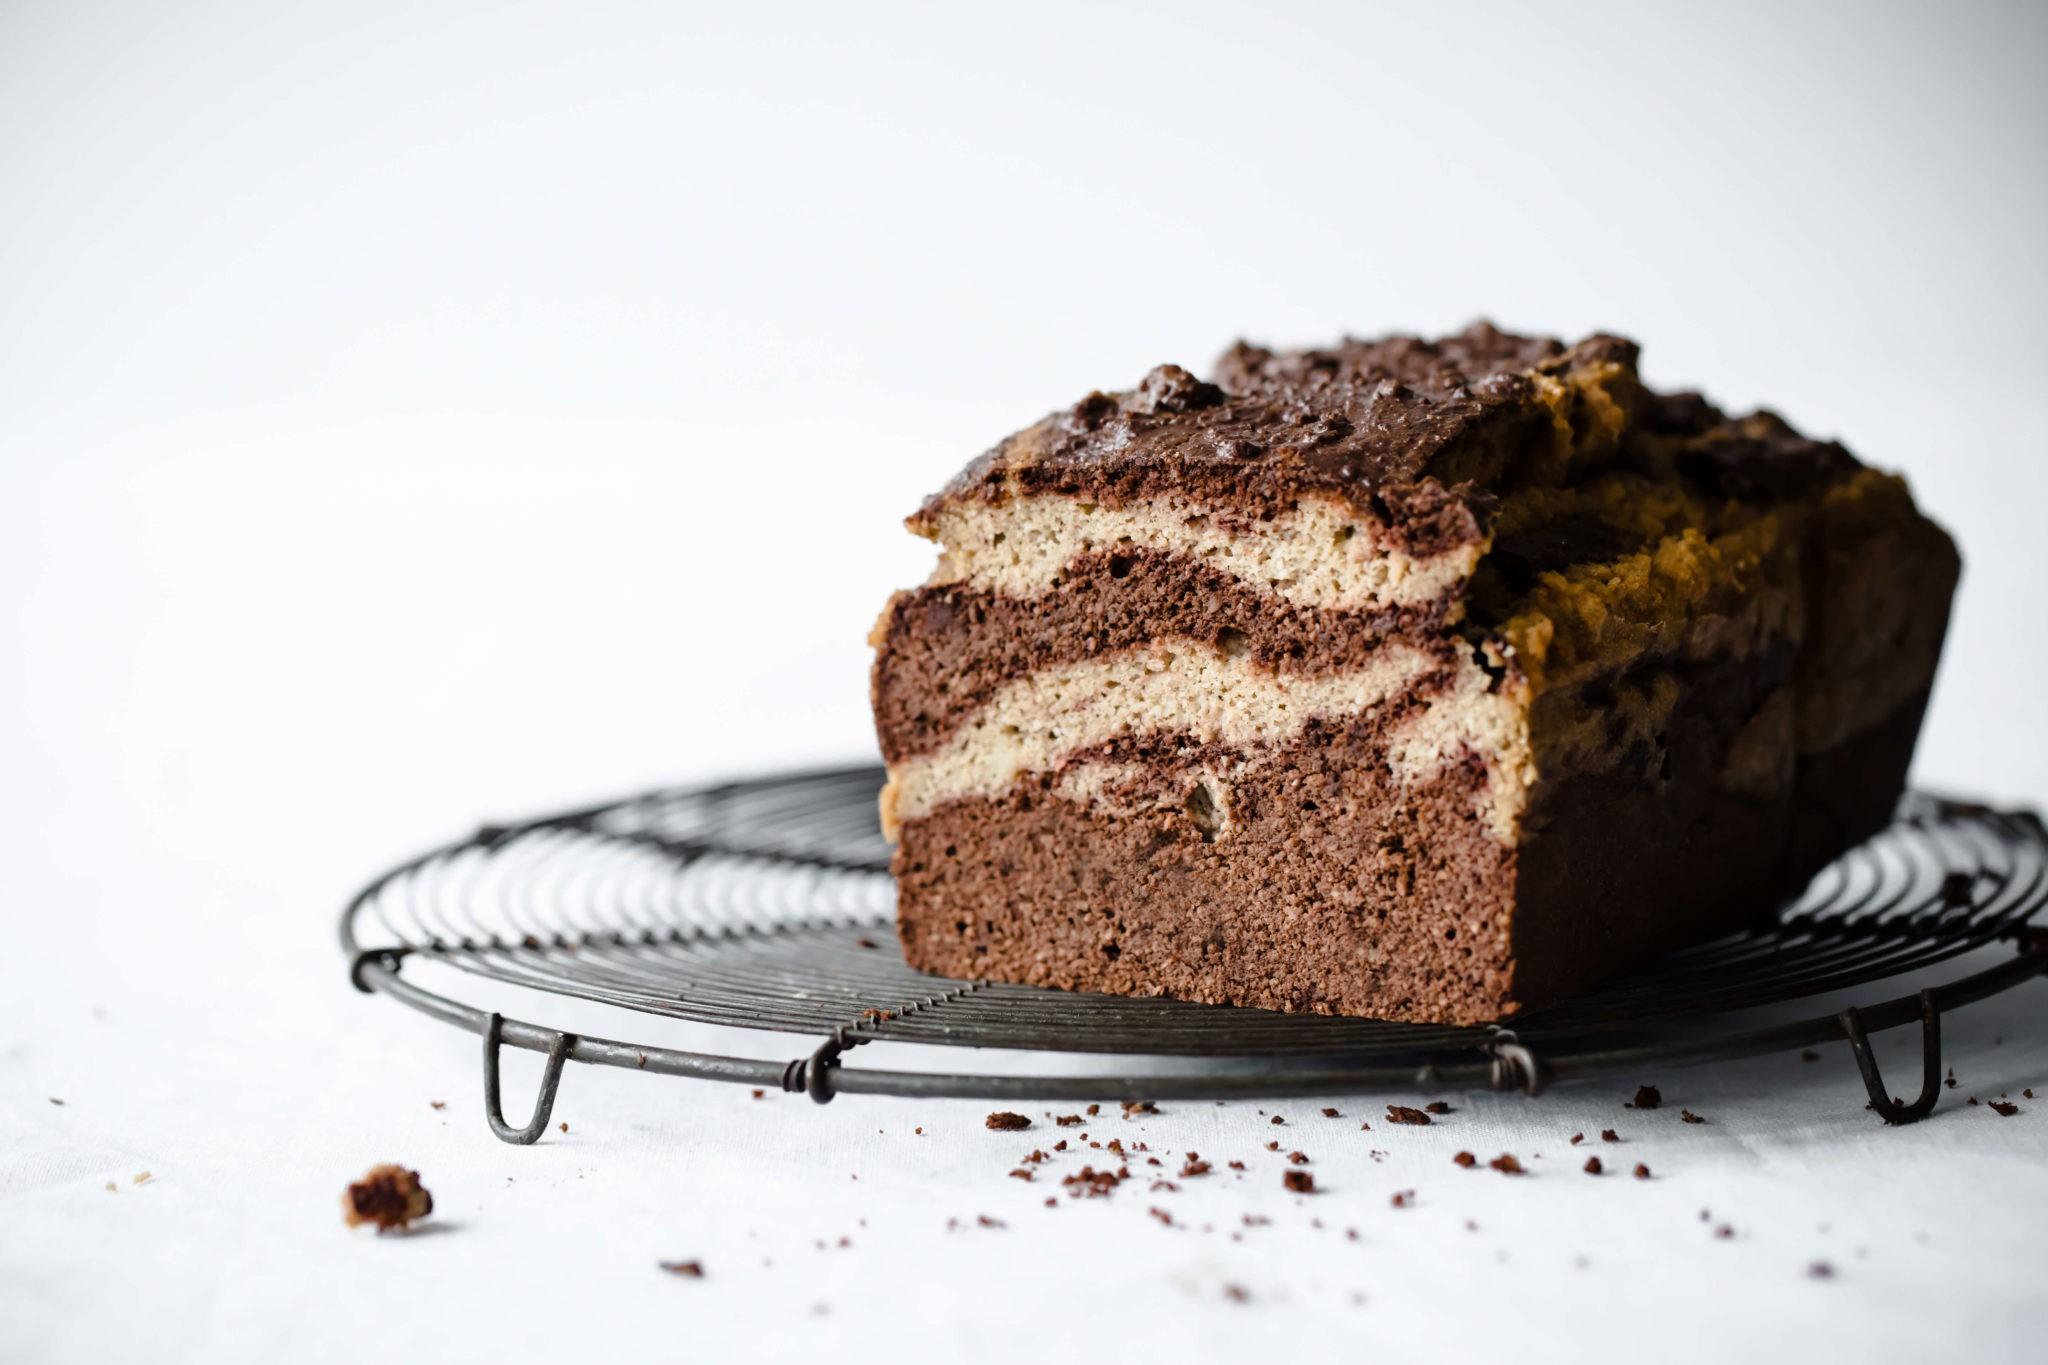 Keto Chocolate Cake Recipe With Almond Flour: Keto Chocolate Vanilla Marble Pound Cake